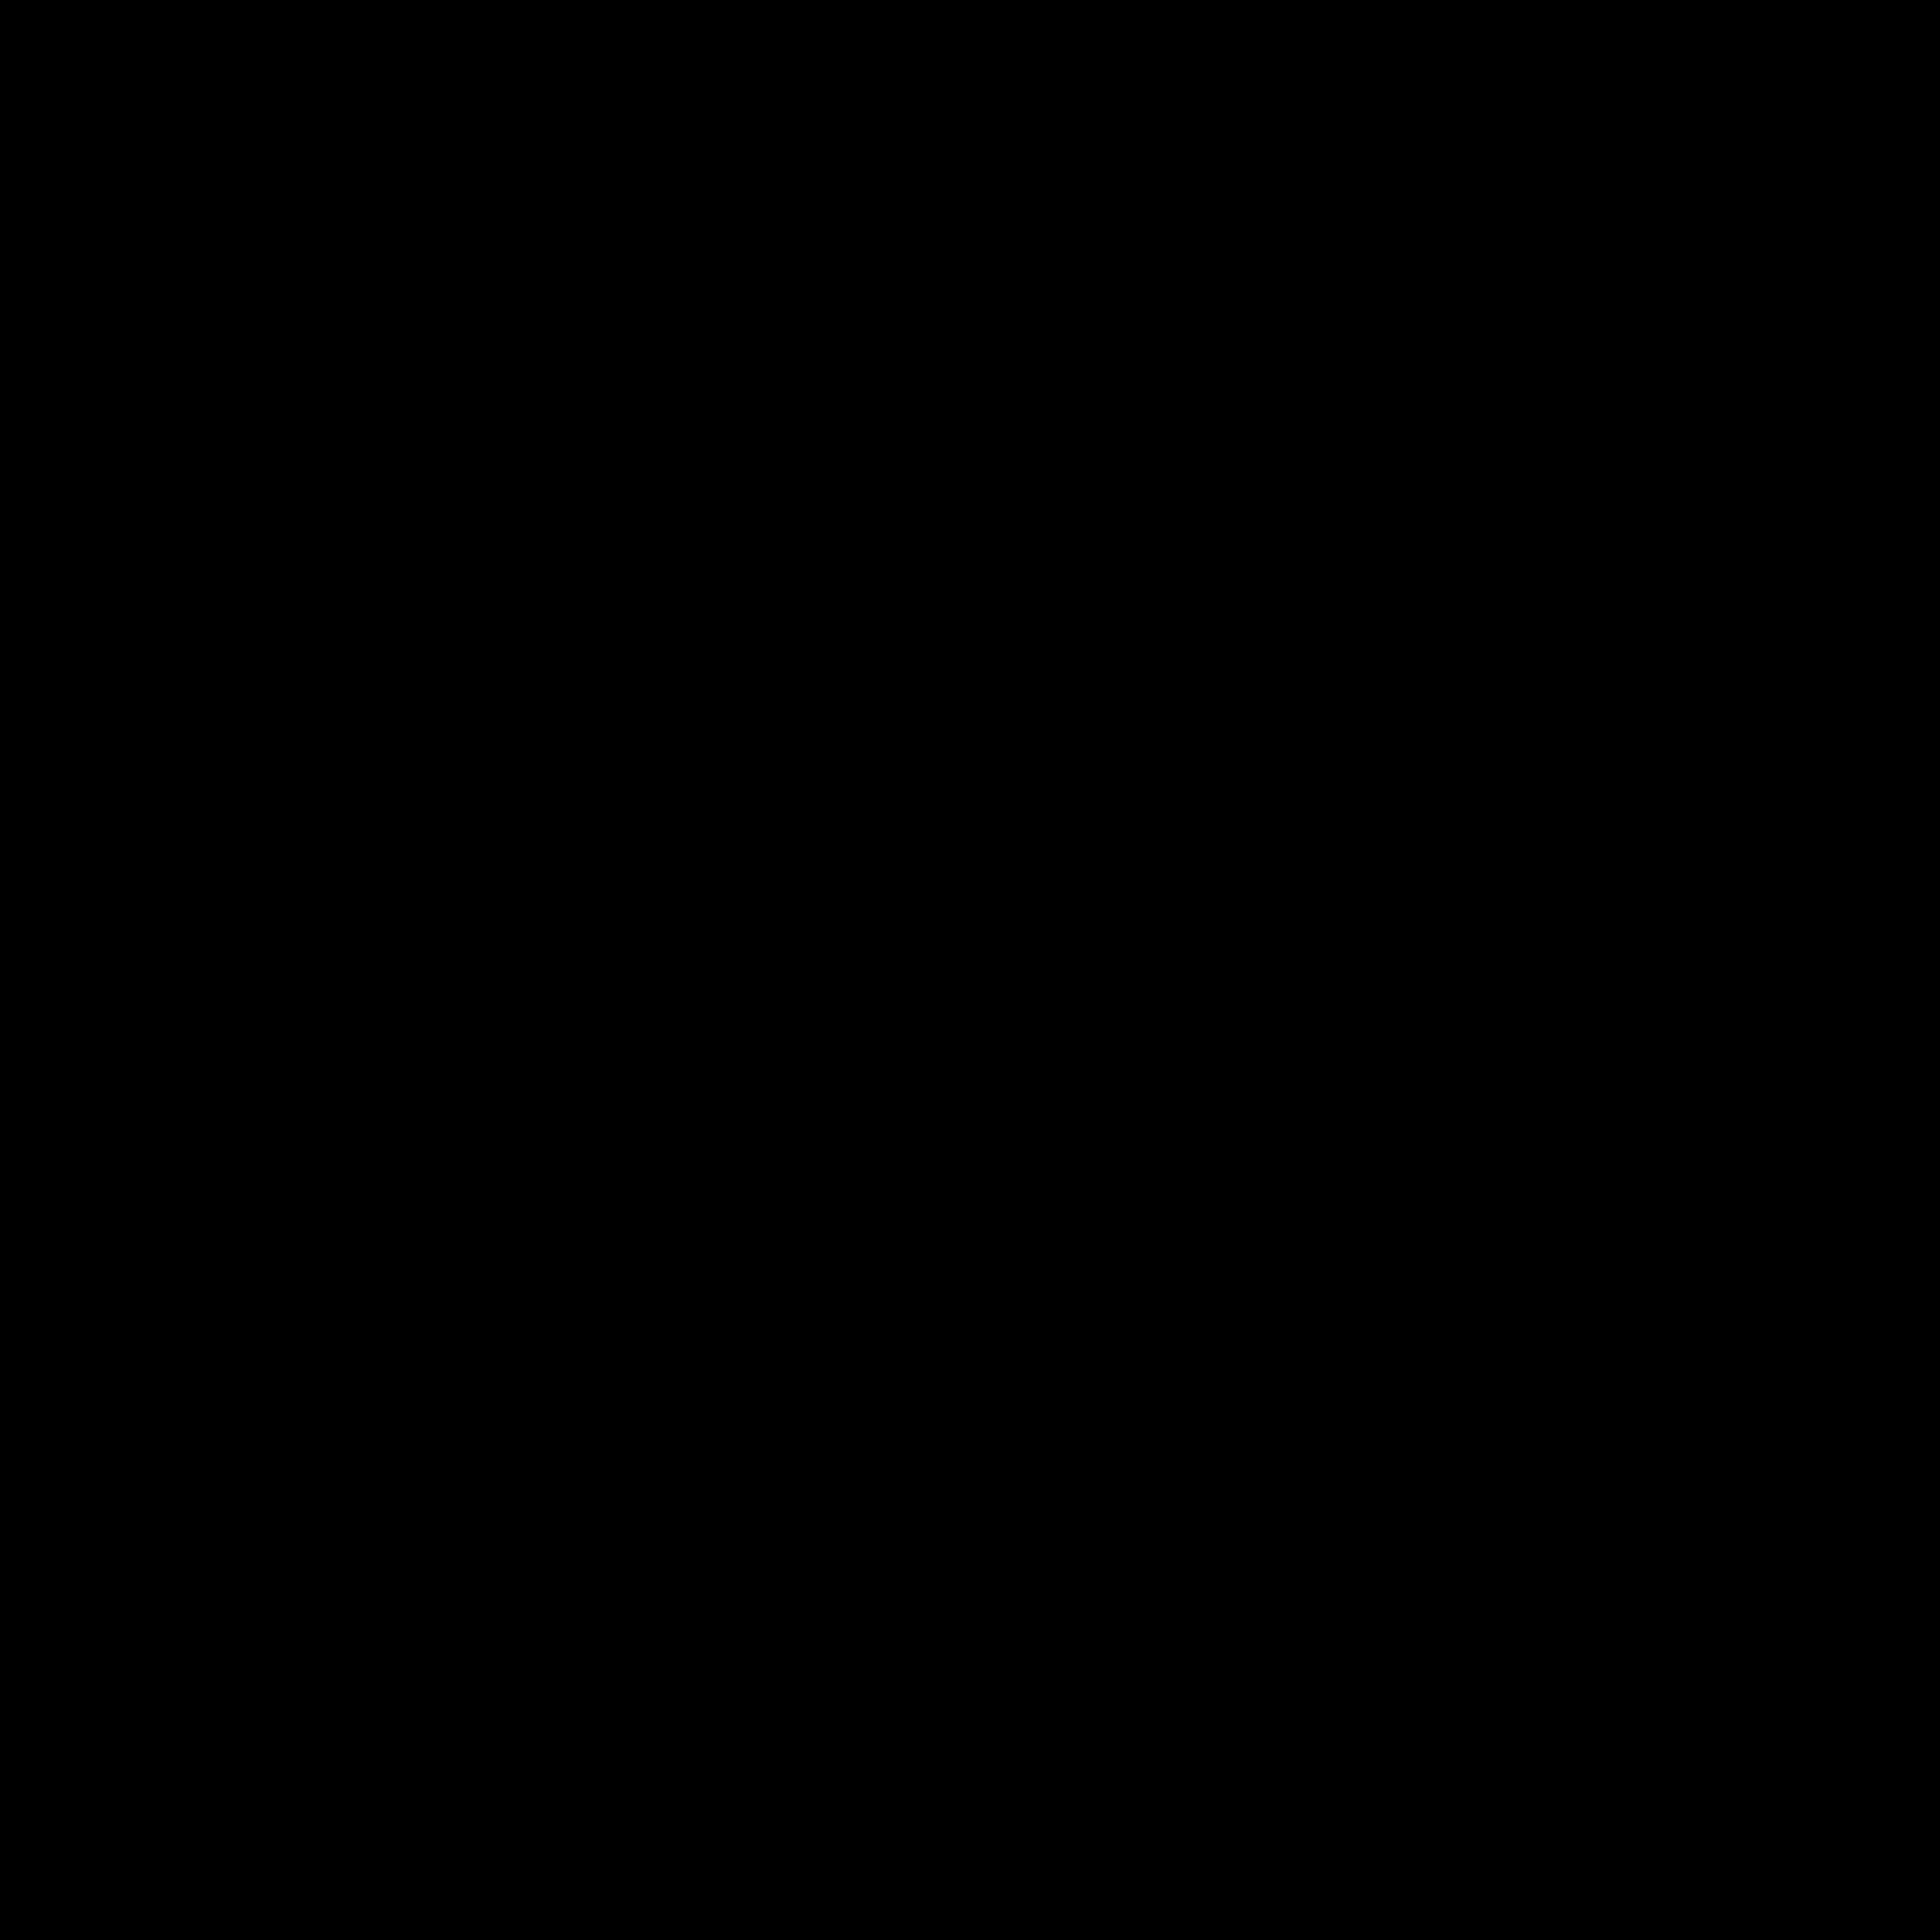 png circle border transparent circle borderpng images